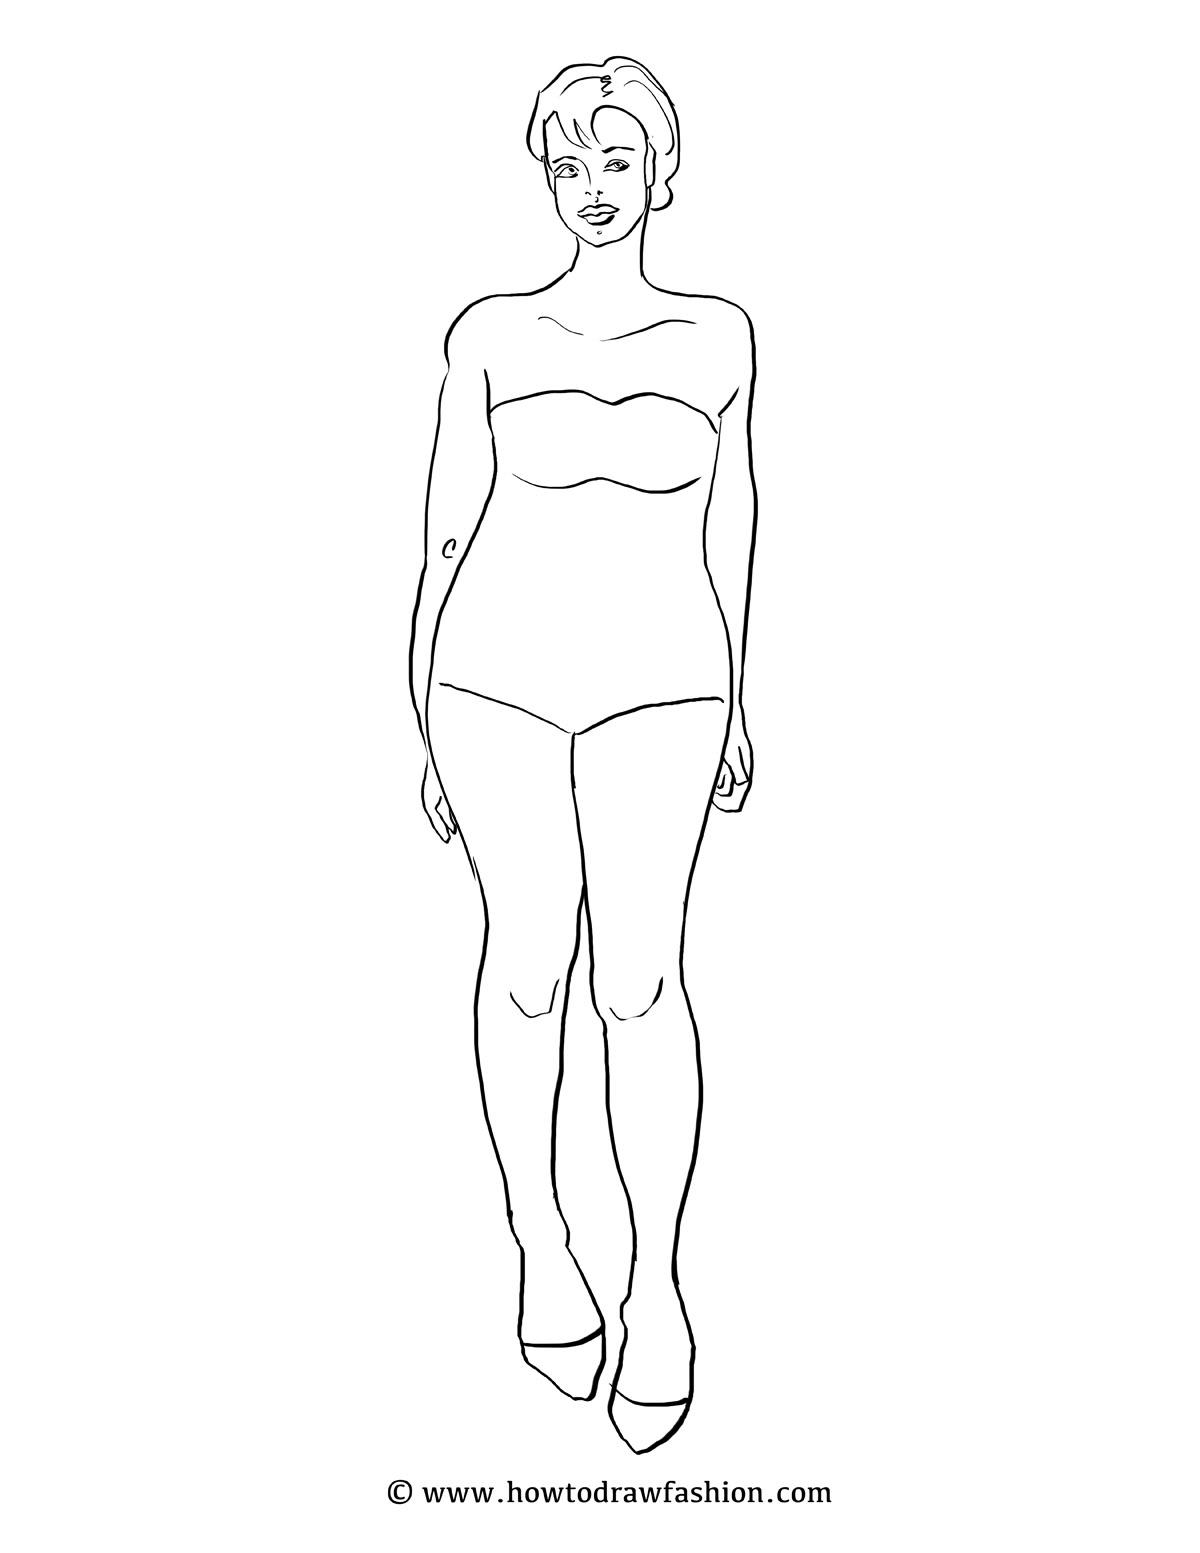 1200x1553 How To Draw Fashion Fashion Templates (Women)